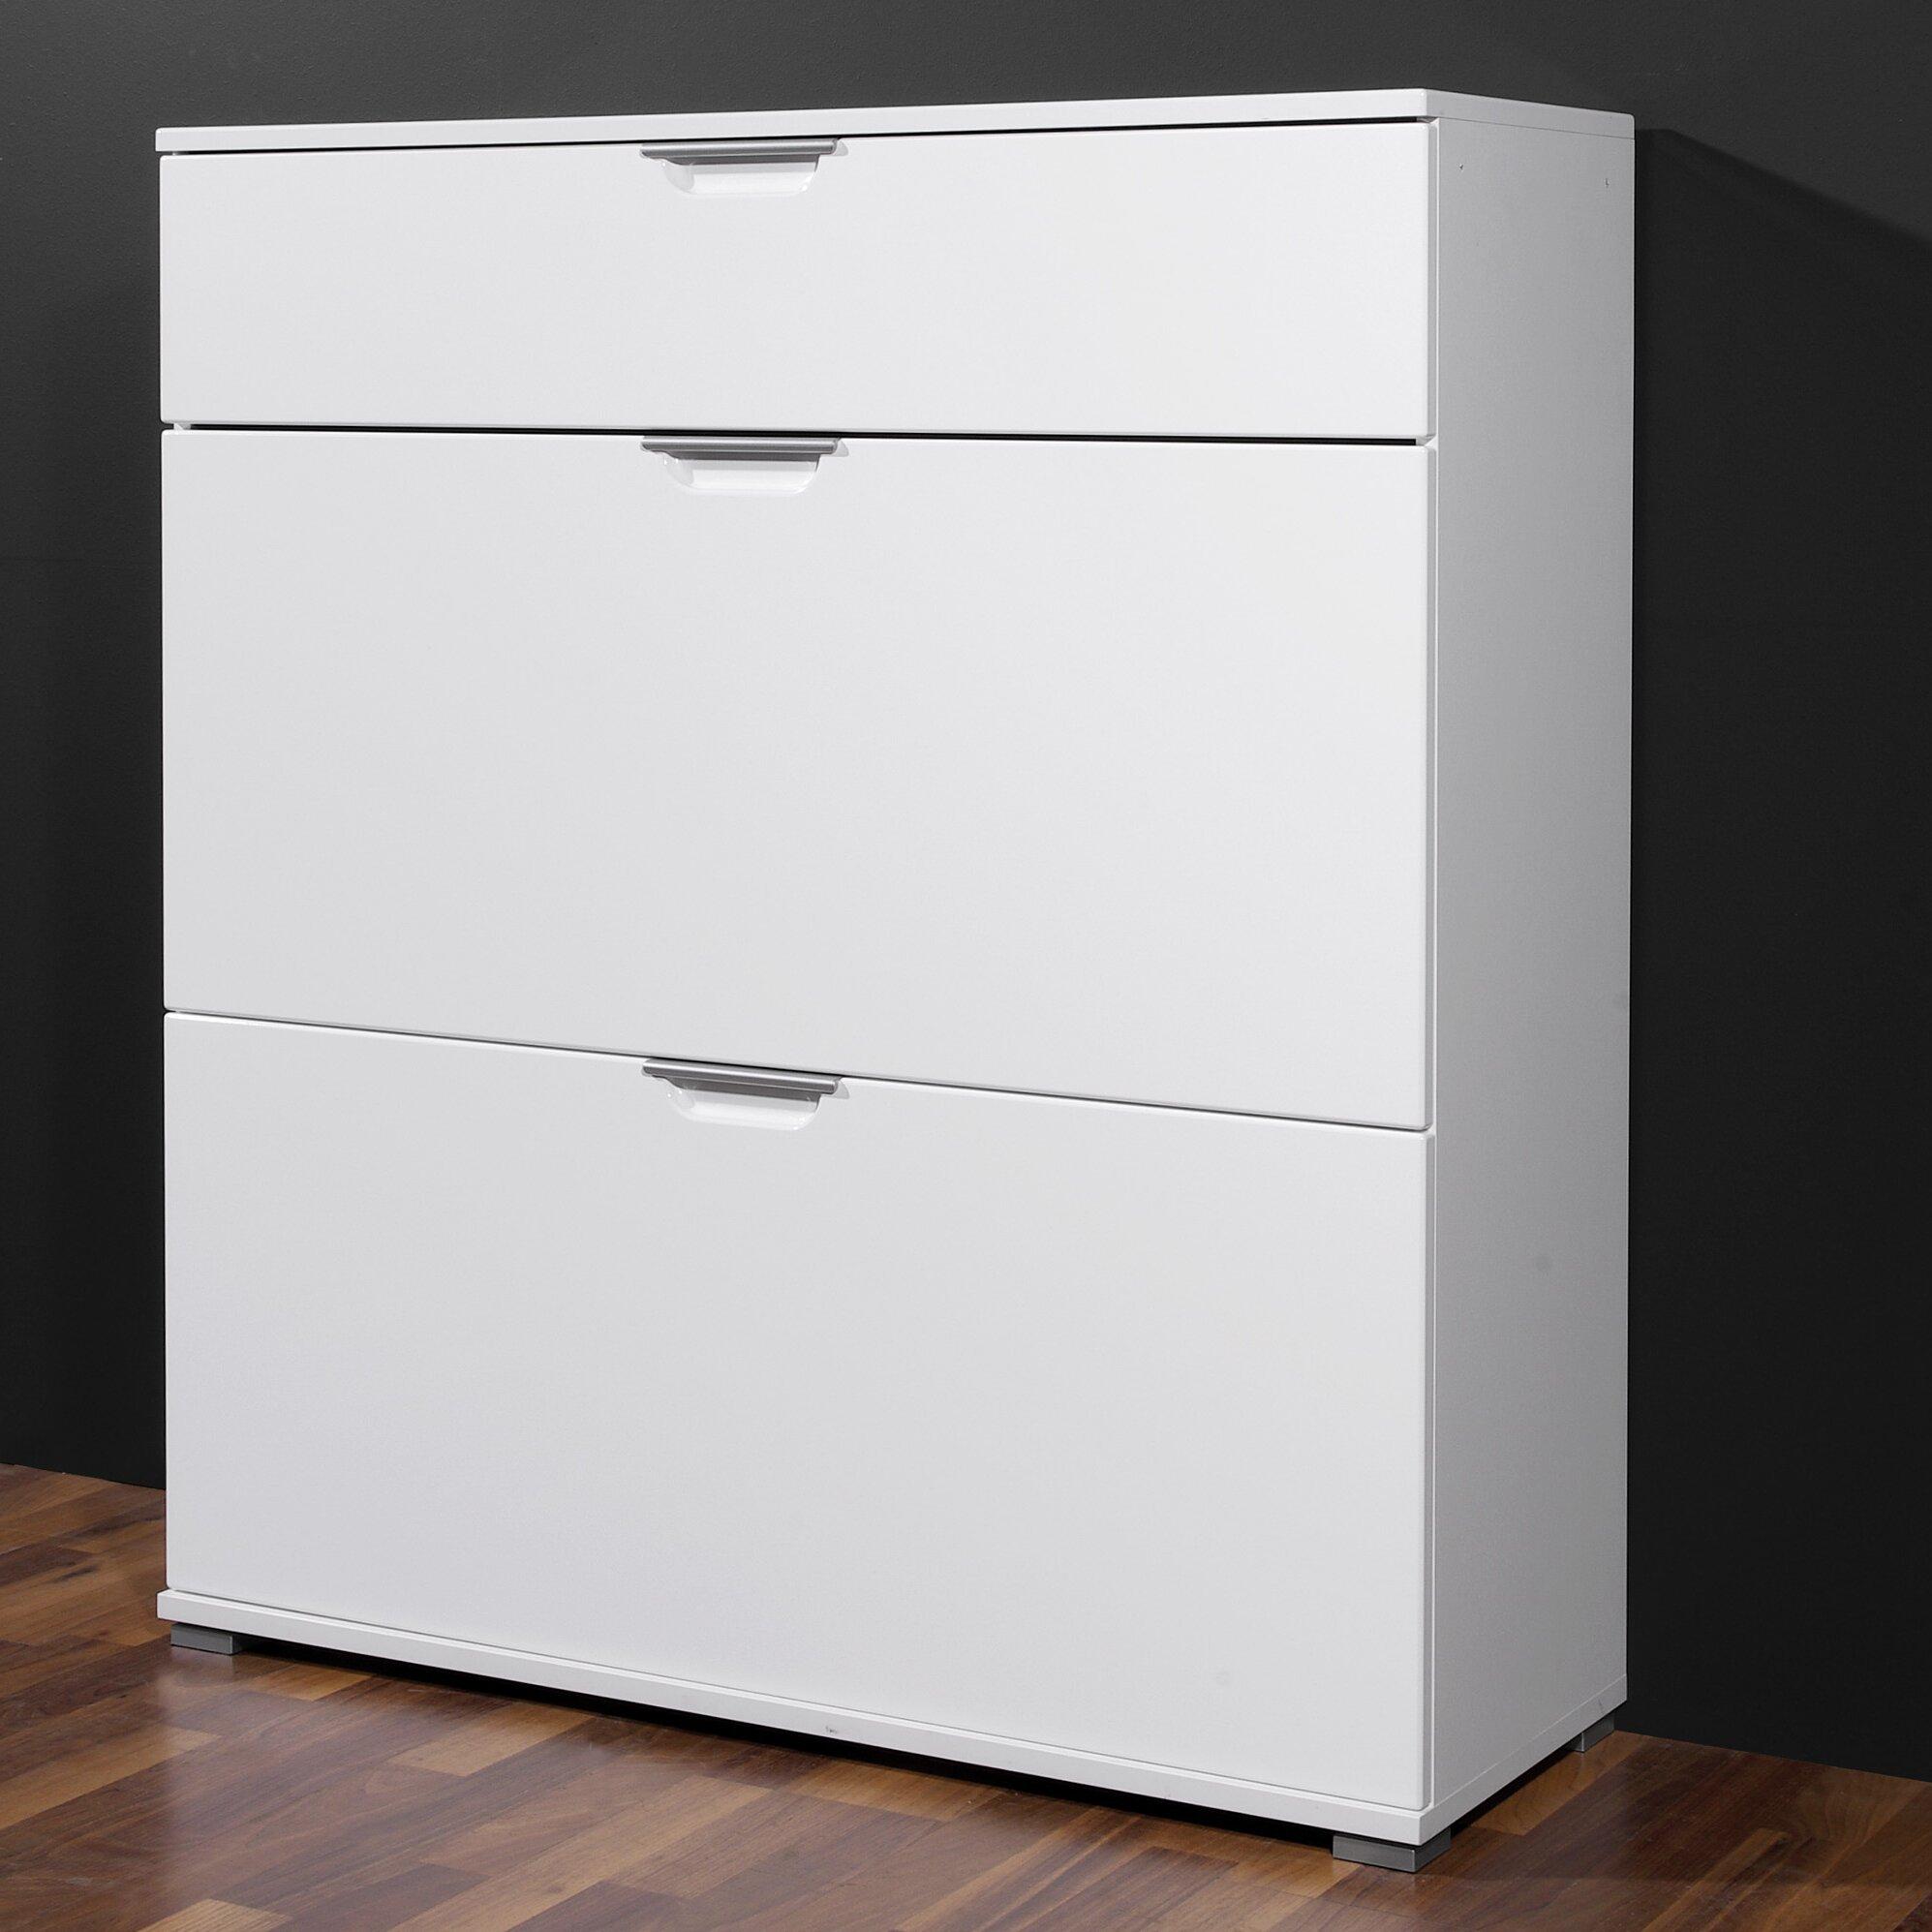 toptip schuhschrank smartpersoneelsdossier. Black Bedroom Furniture Sets. Home Design Ideas